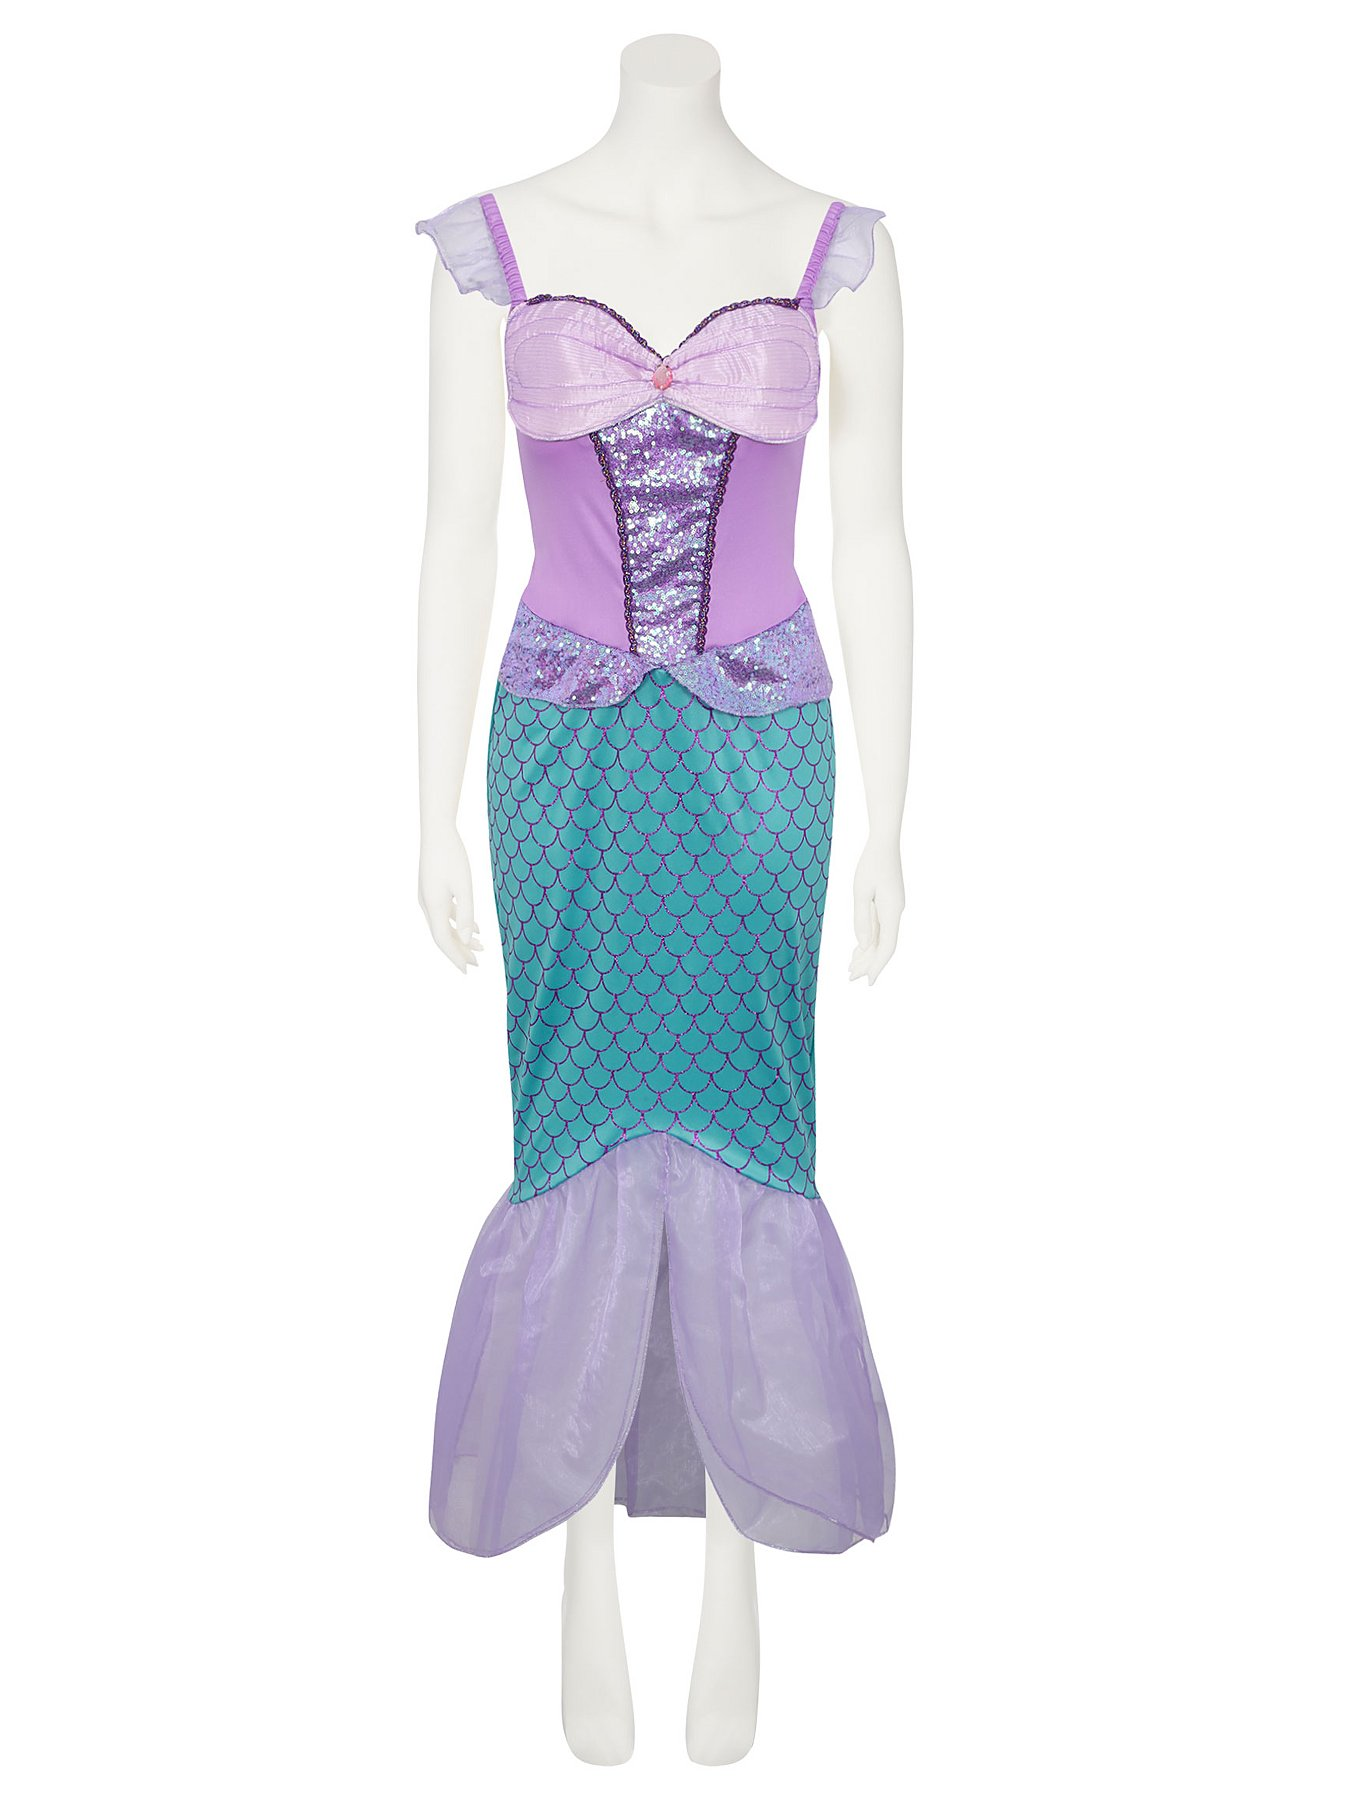 Fine Asda Wedding Dresses Festooning - Womens Dresses & Gowns ...